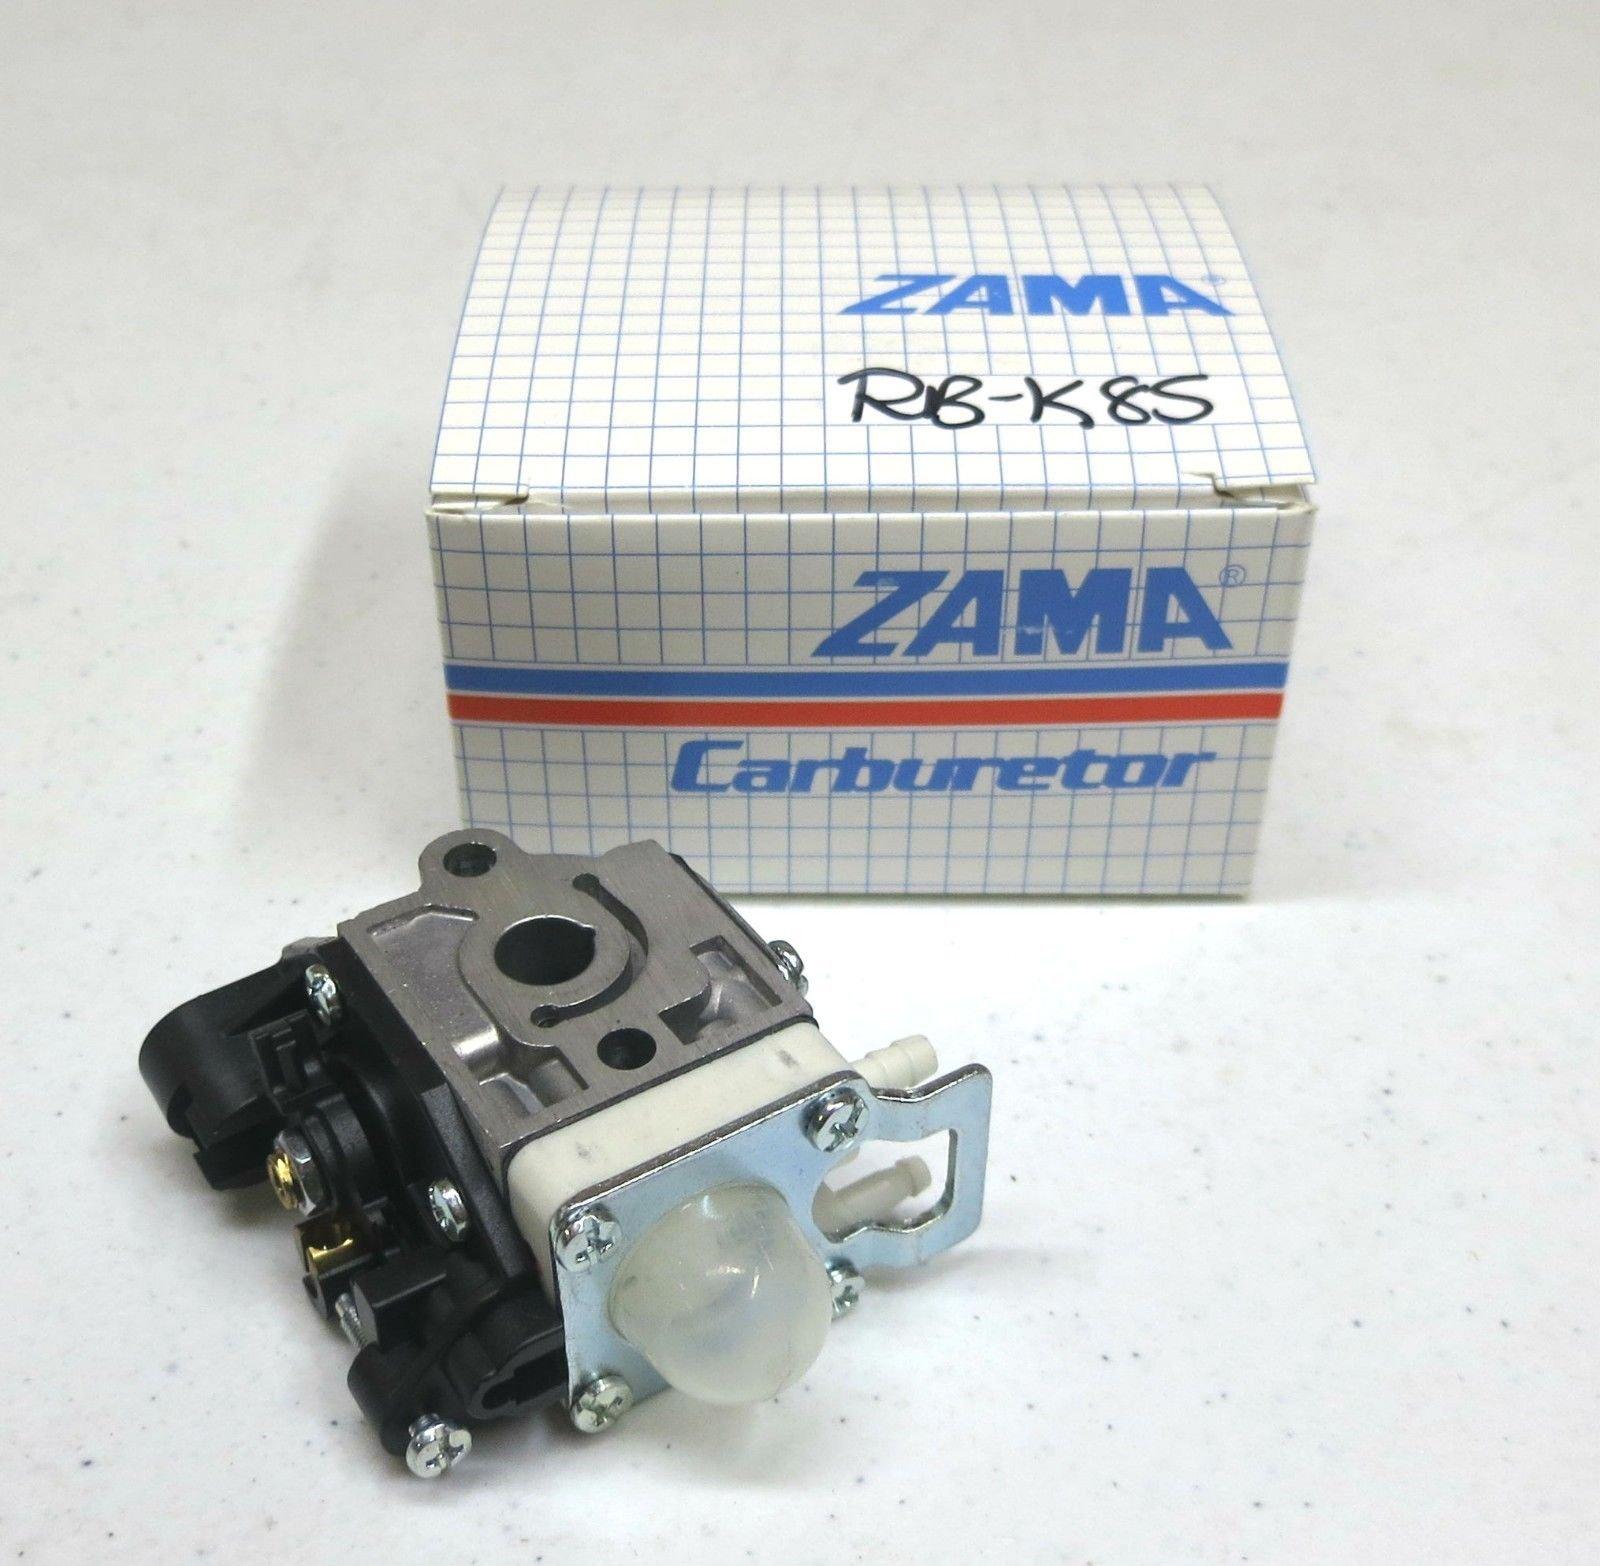 New OEM Zama RB-K85 CARBURETOR Carb Echo PB-251 PB-265L PB-265LN Power Blowers supplier_id_theropshop, #UGEIO39251485941239